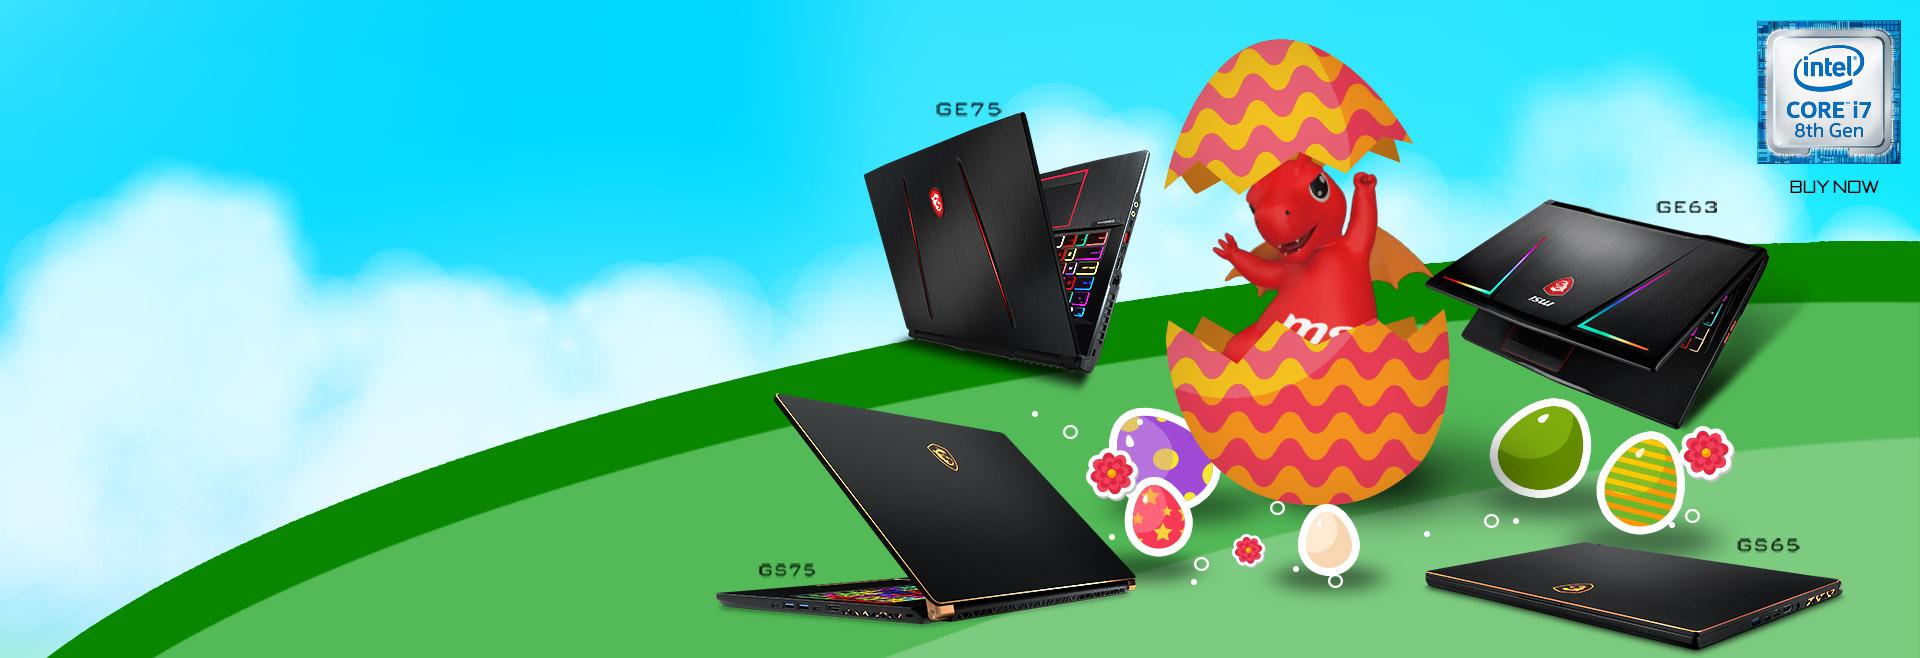 Laptop Easter Sales Msi Australia